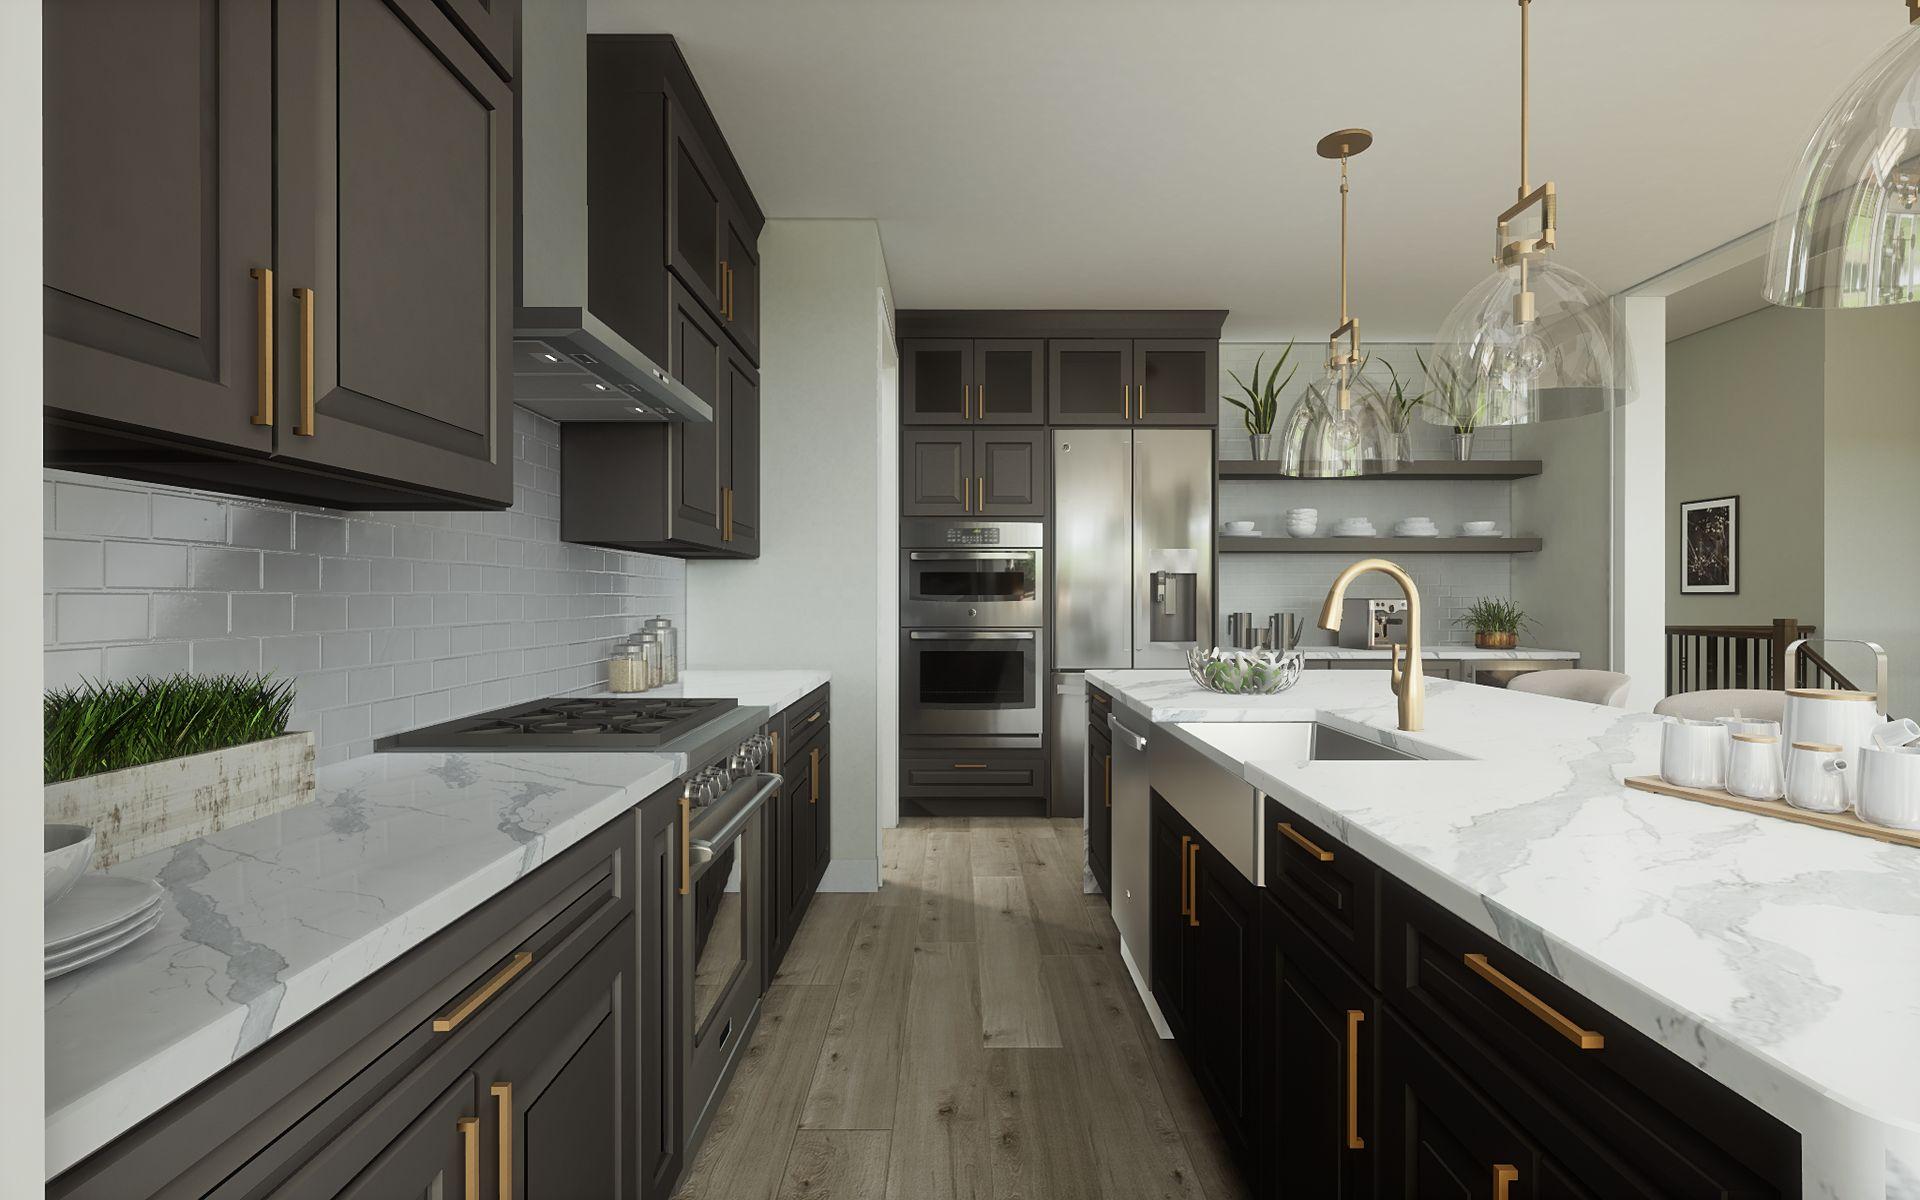 Kitchen Design Ideas For 2020 Robertson Homes